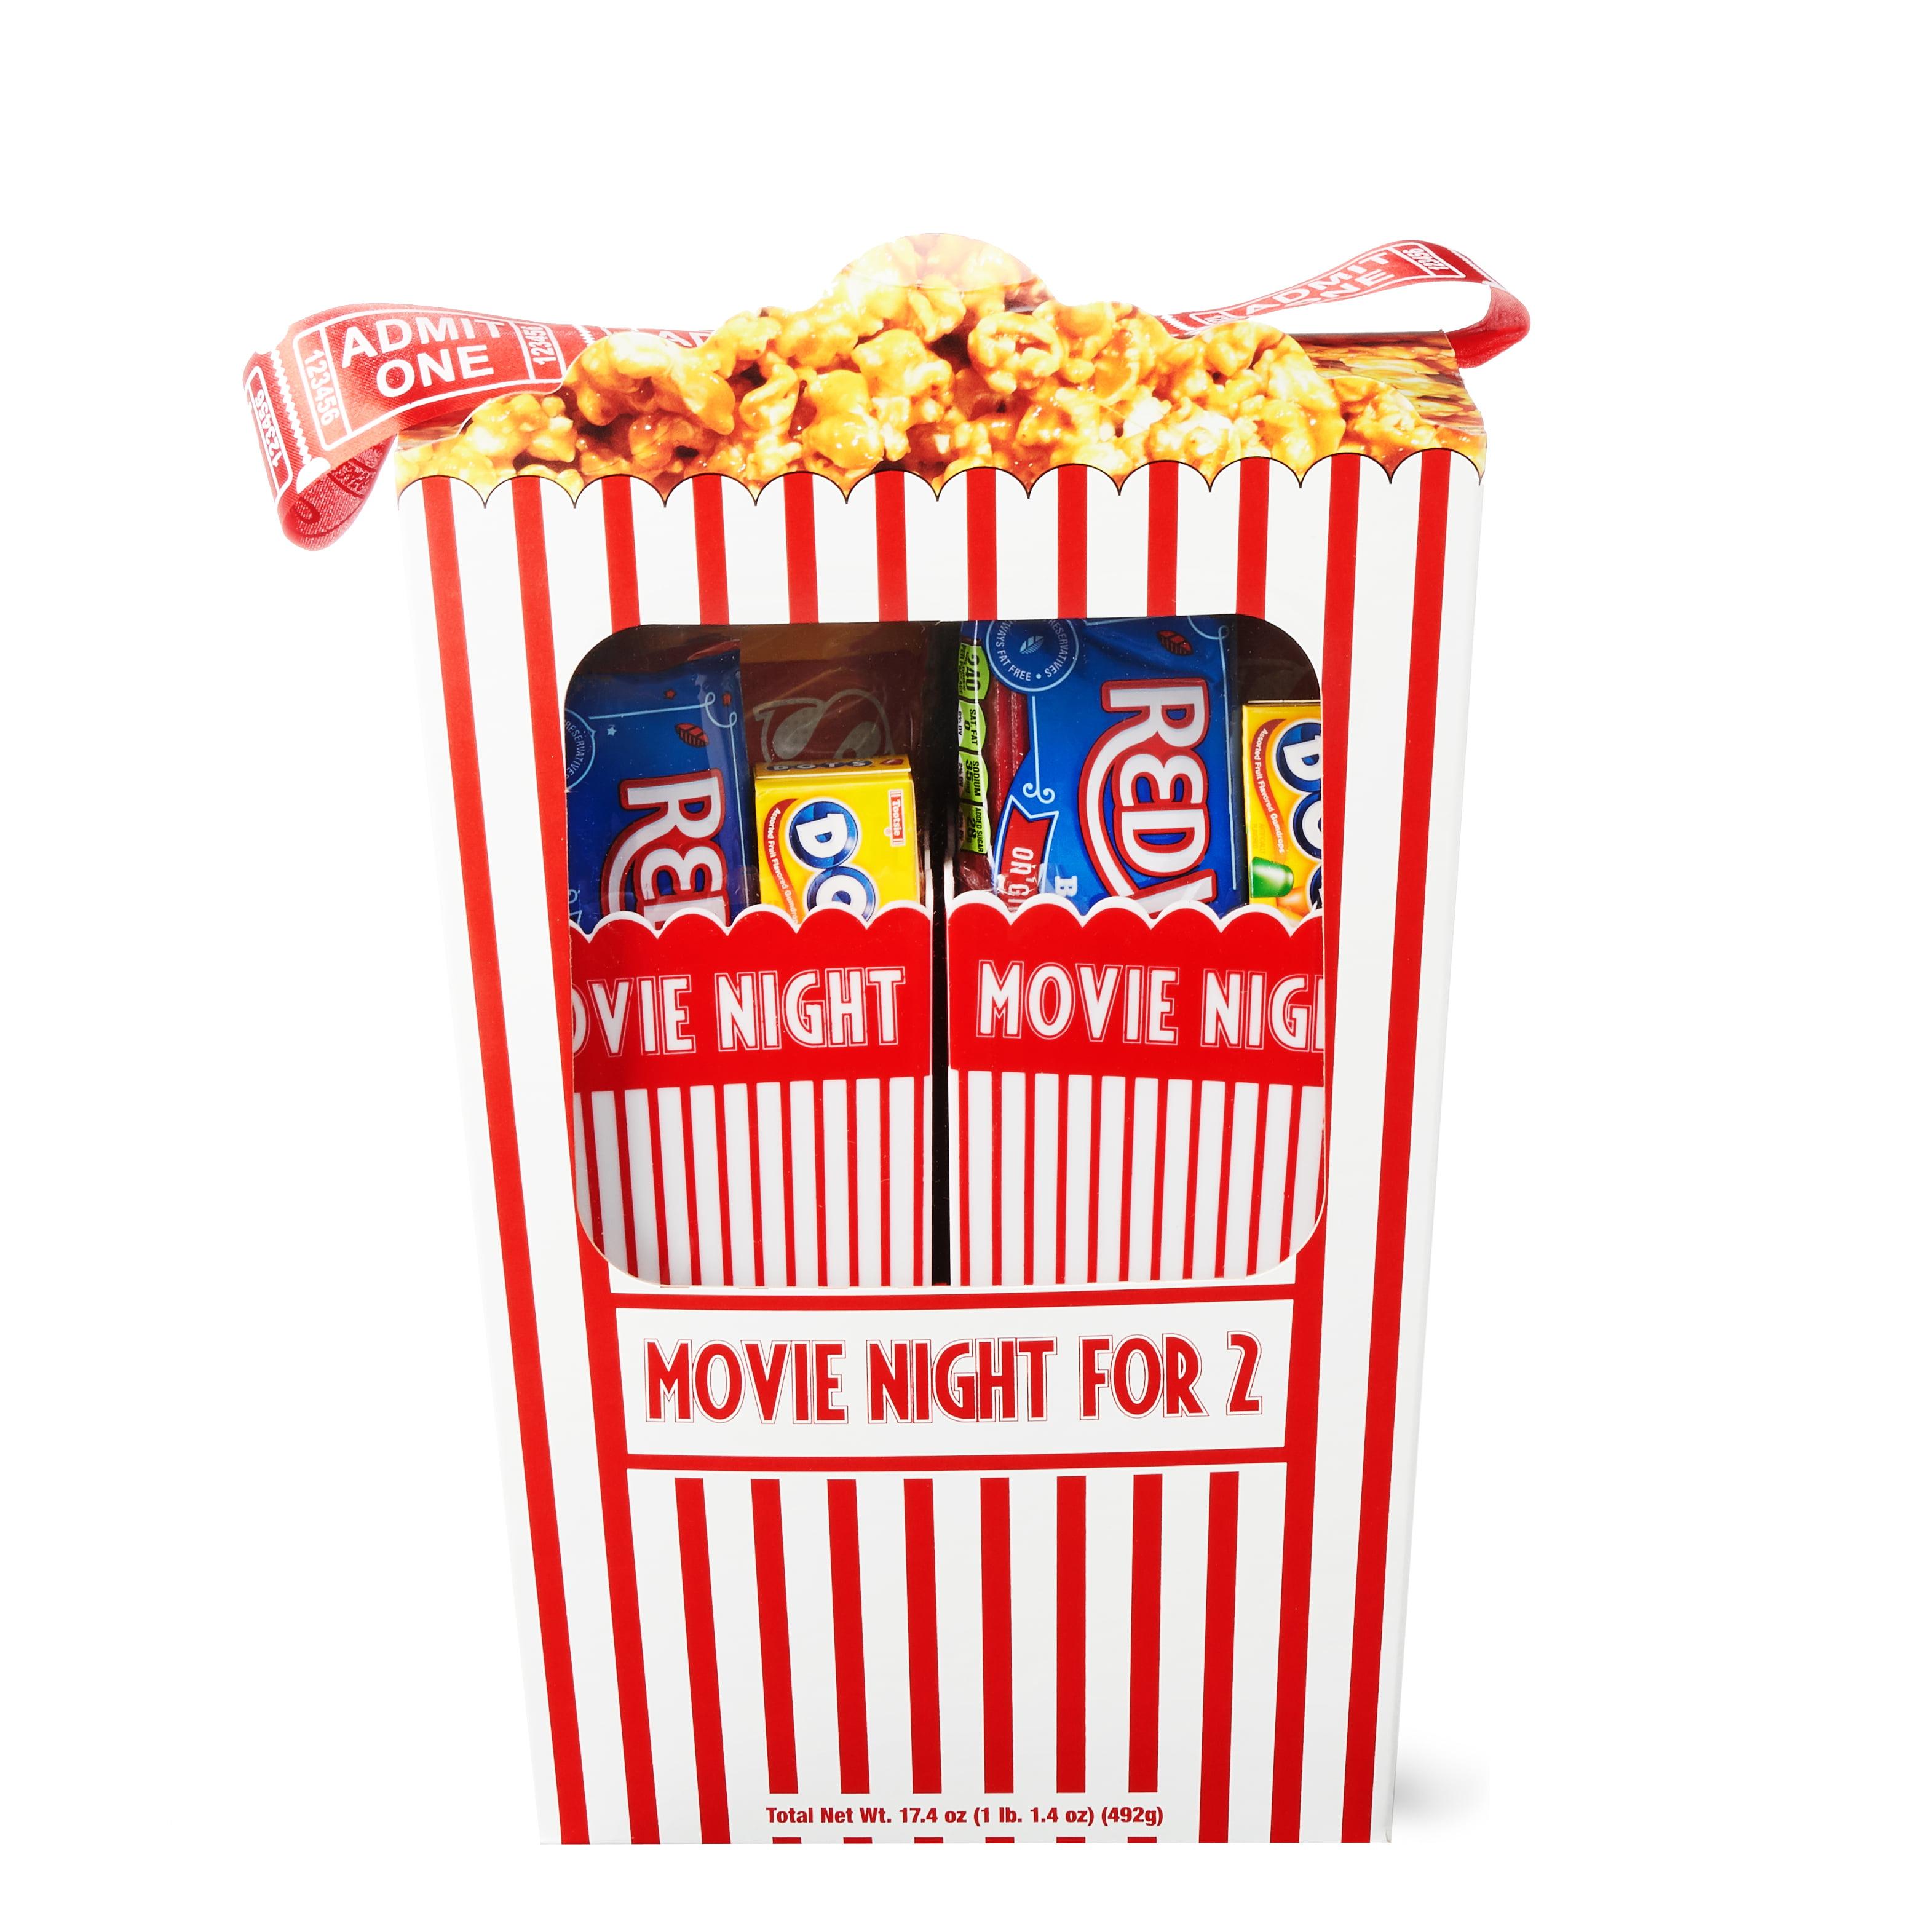 Movie Night for Two Popcorn Box